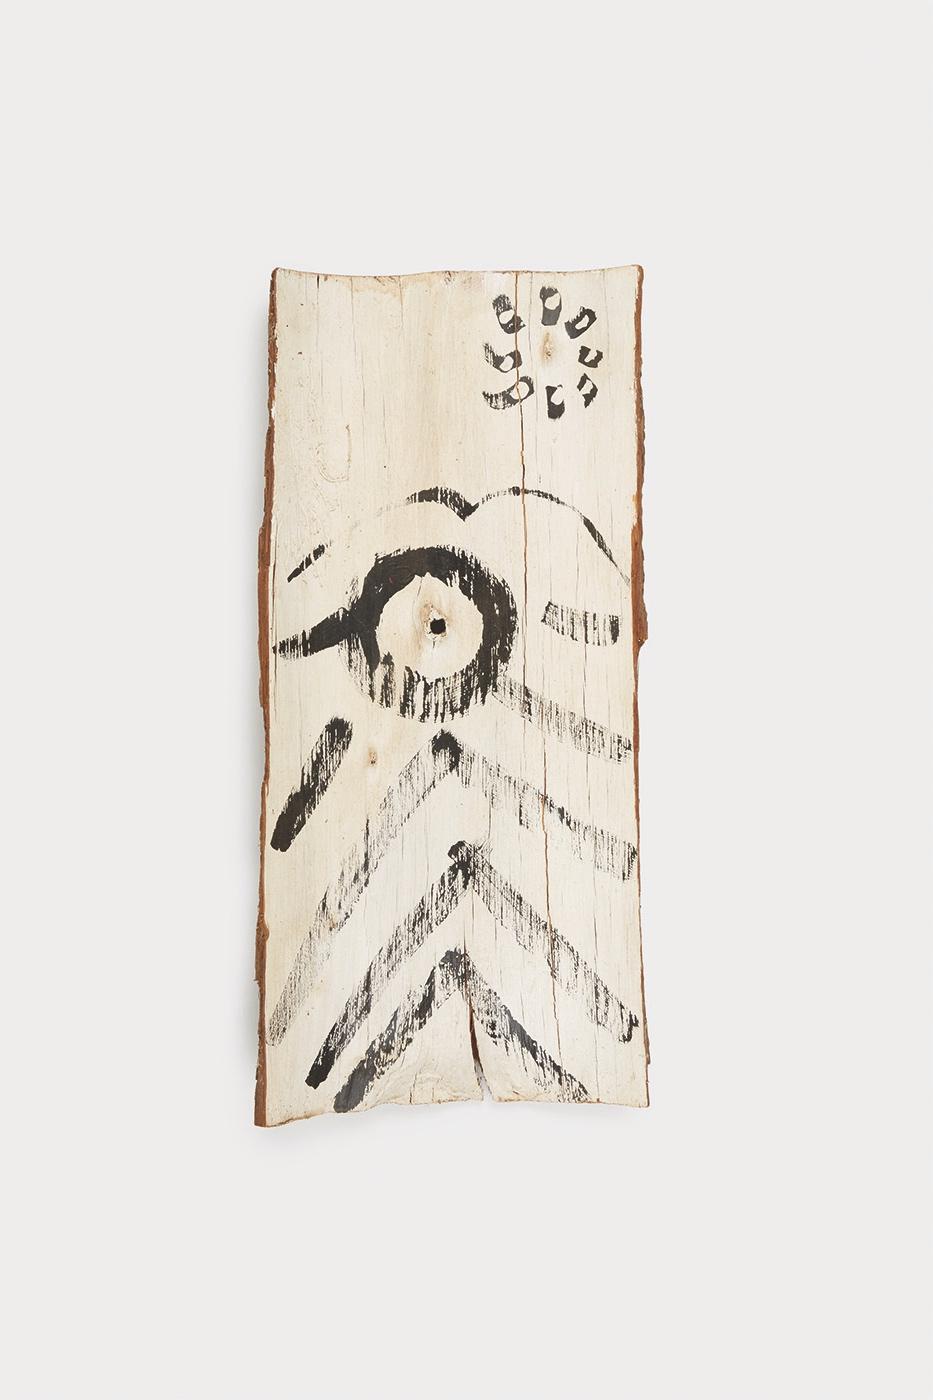 Untitled   Acrylic on Redwood bark  11 x 23 inches  27.94 x 58.42 cm